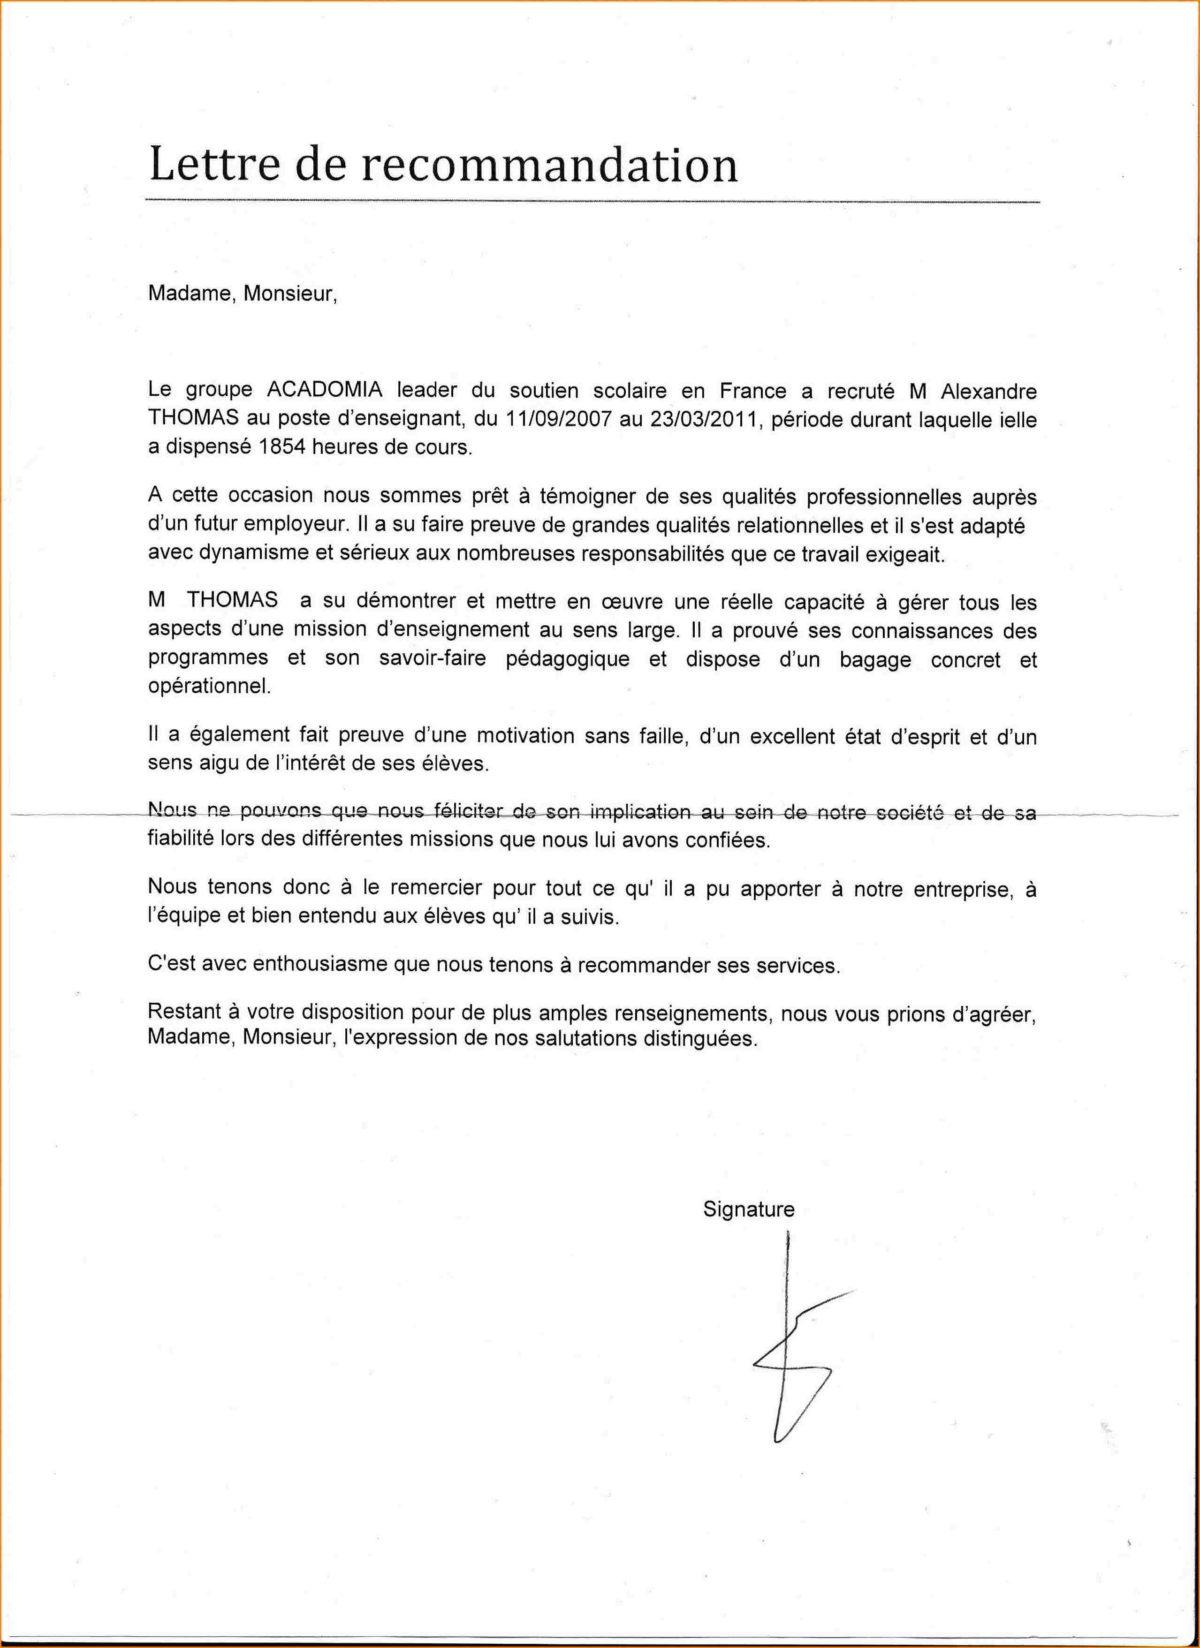 Lettre de rfrence boatremyeaton lettre de rfrence altavistaventures Image collections